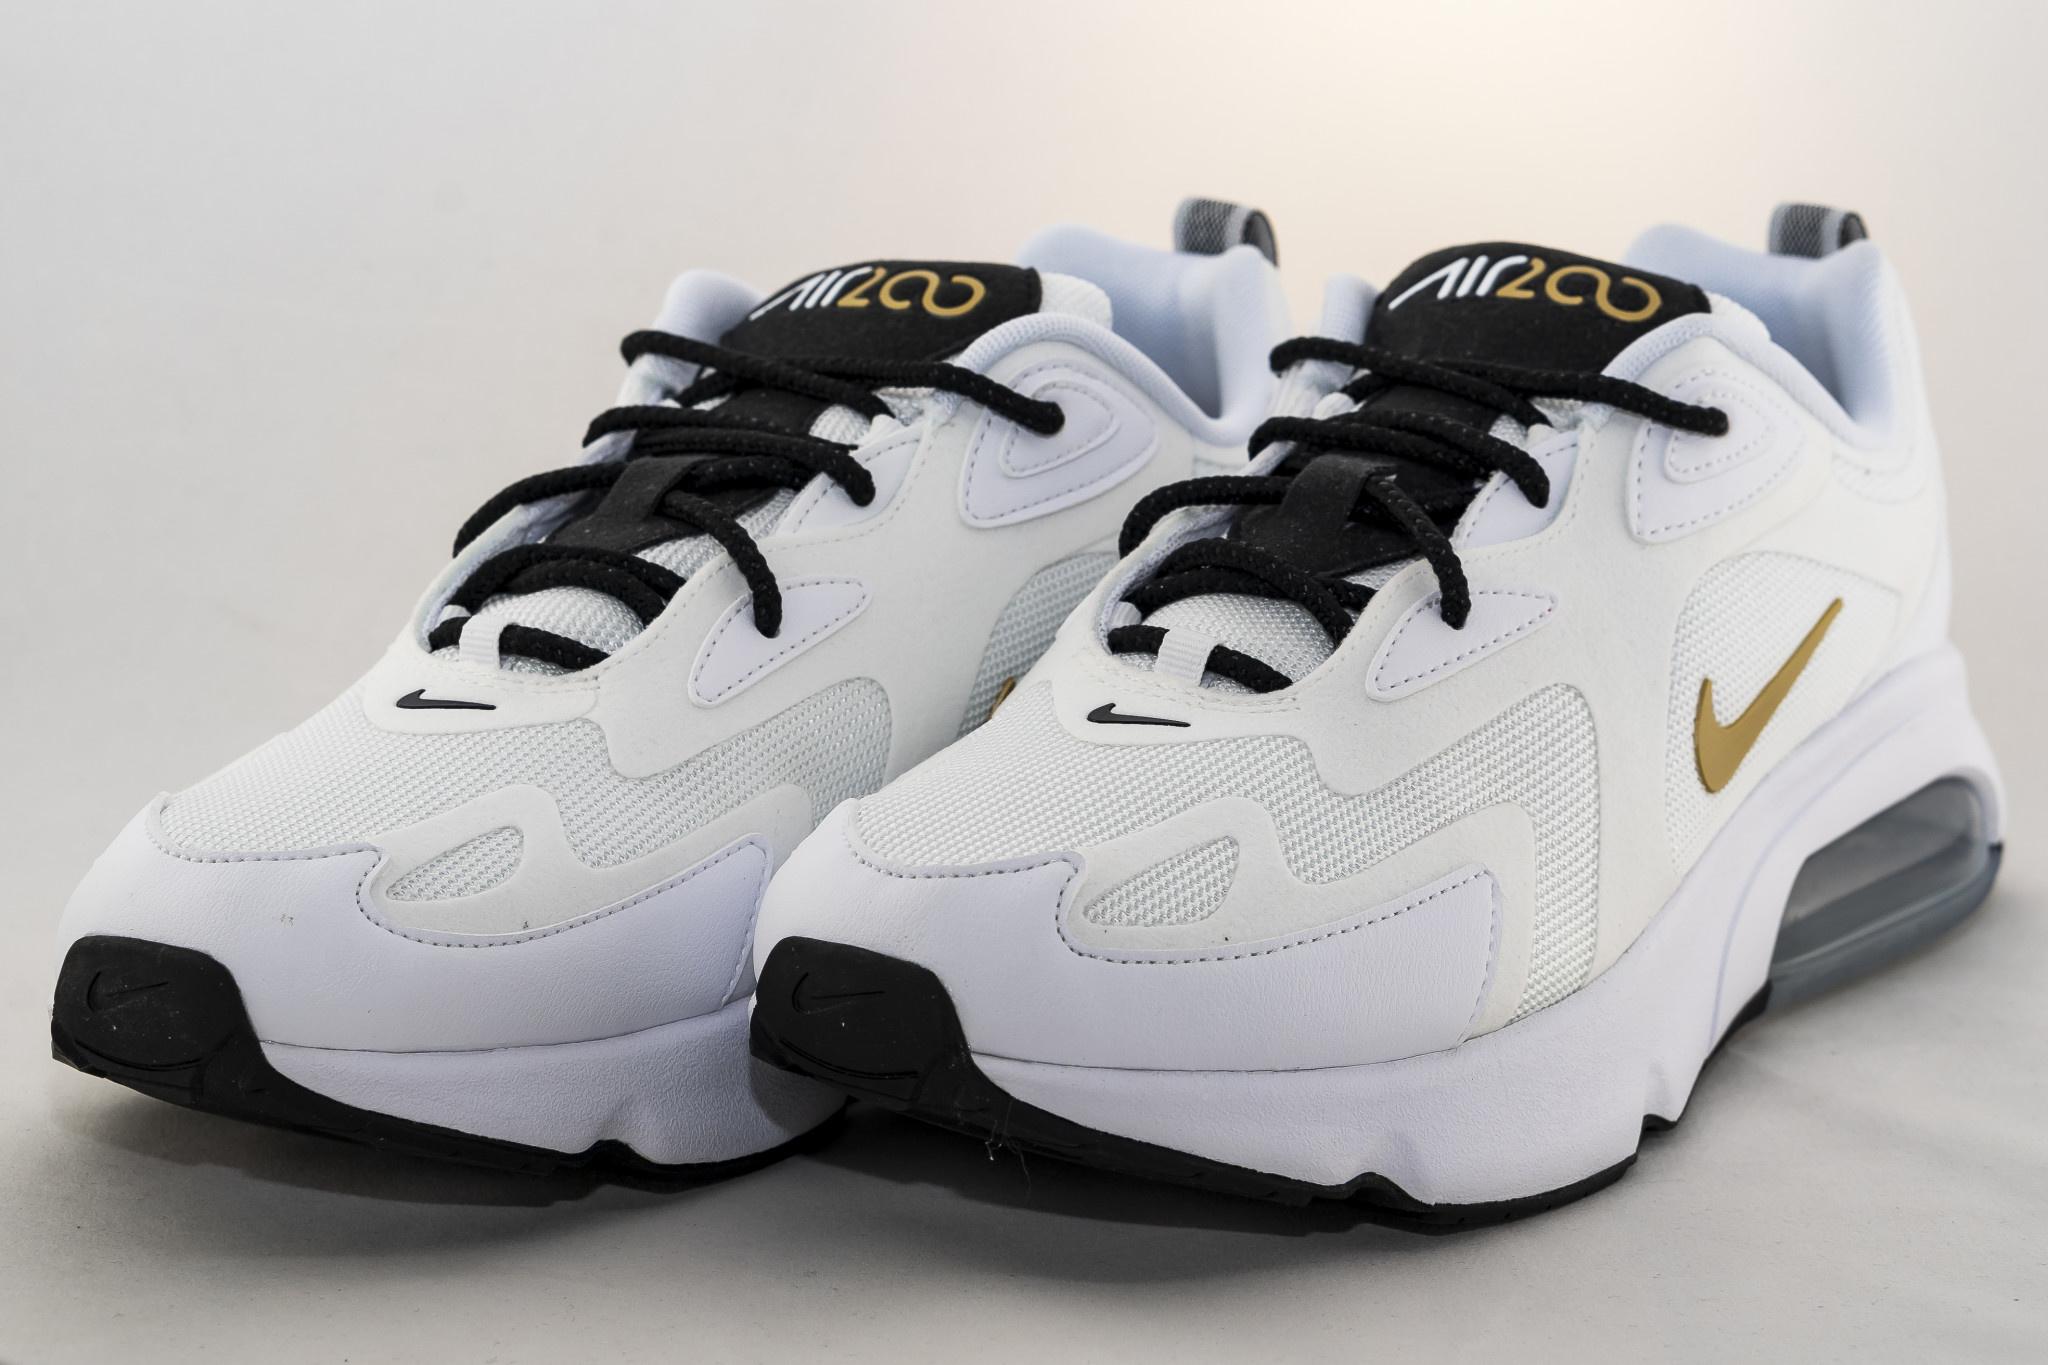 Nike AIR MAX 200 White/ Metallic Gold/ Black